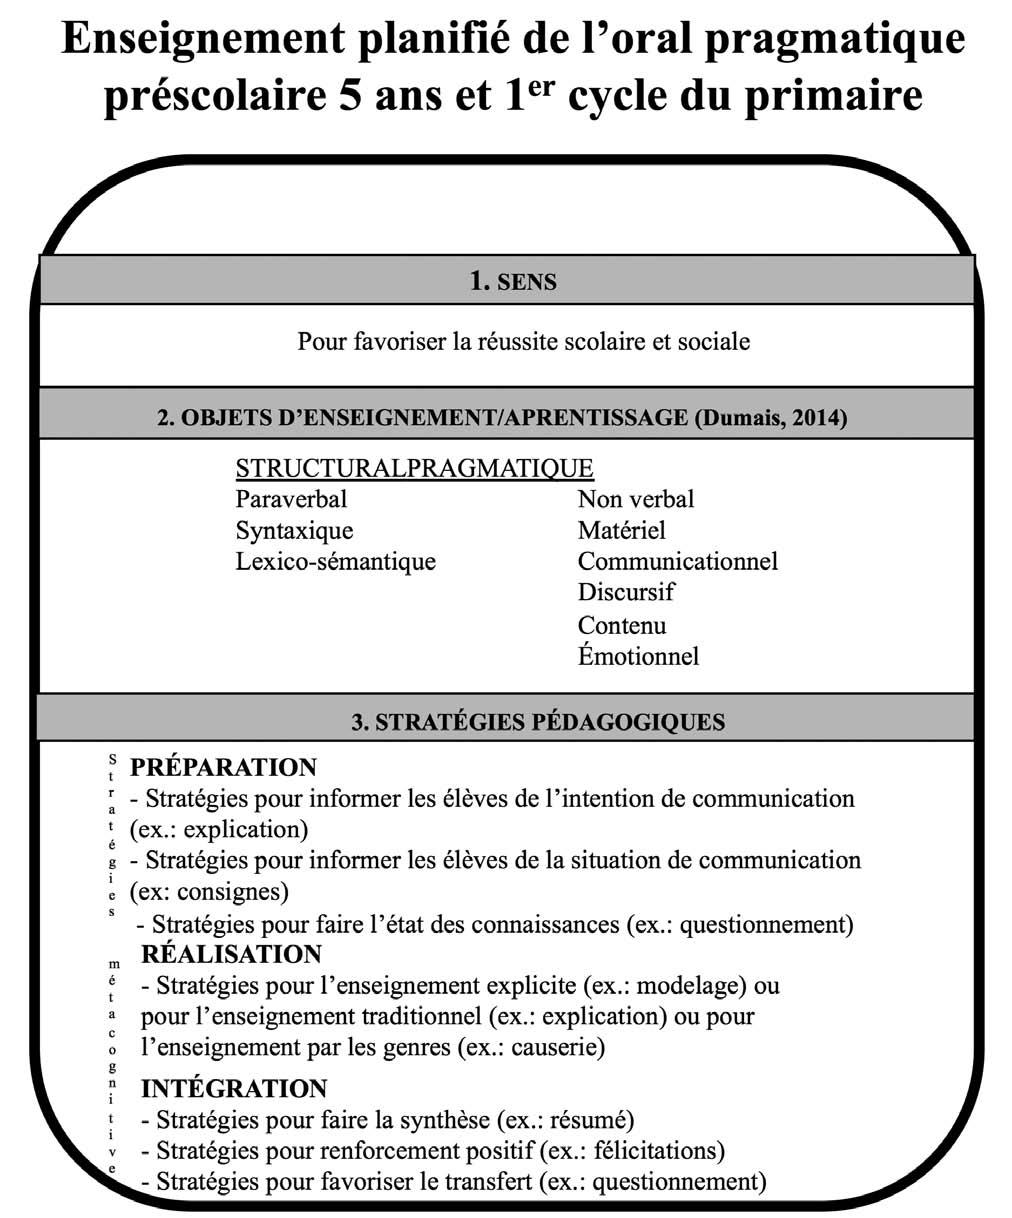 l u2019oral pragmatique   un objet d u2019enseignement  apprentissage